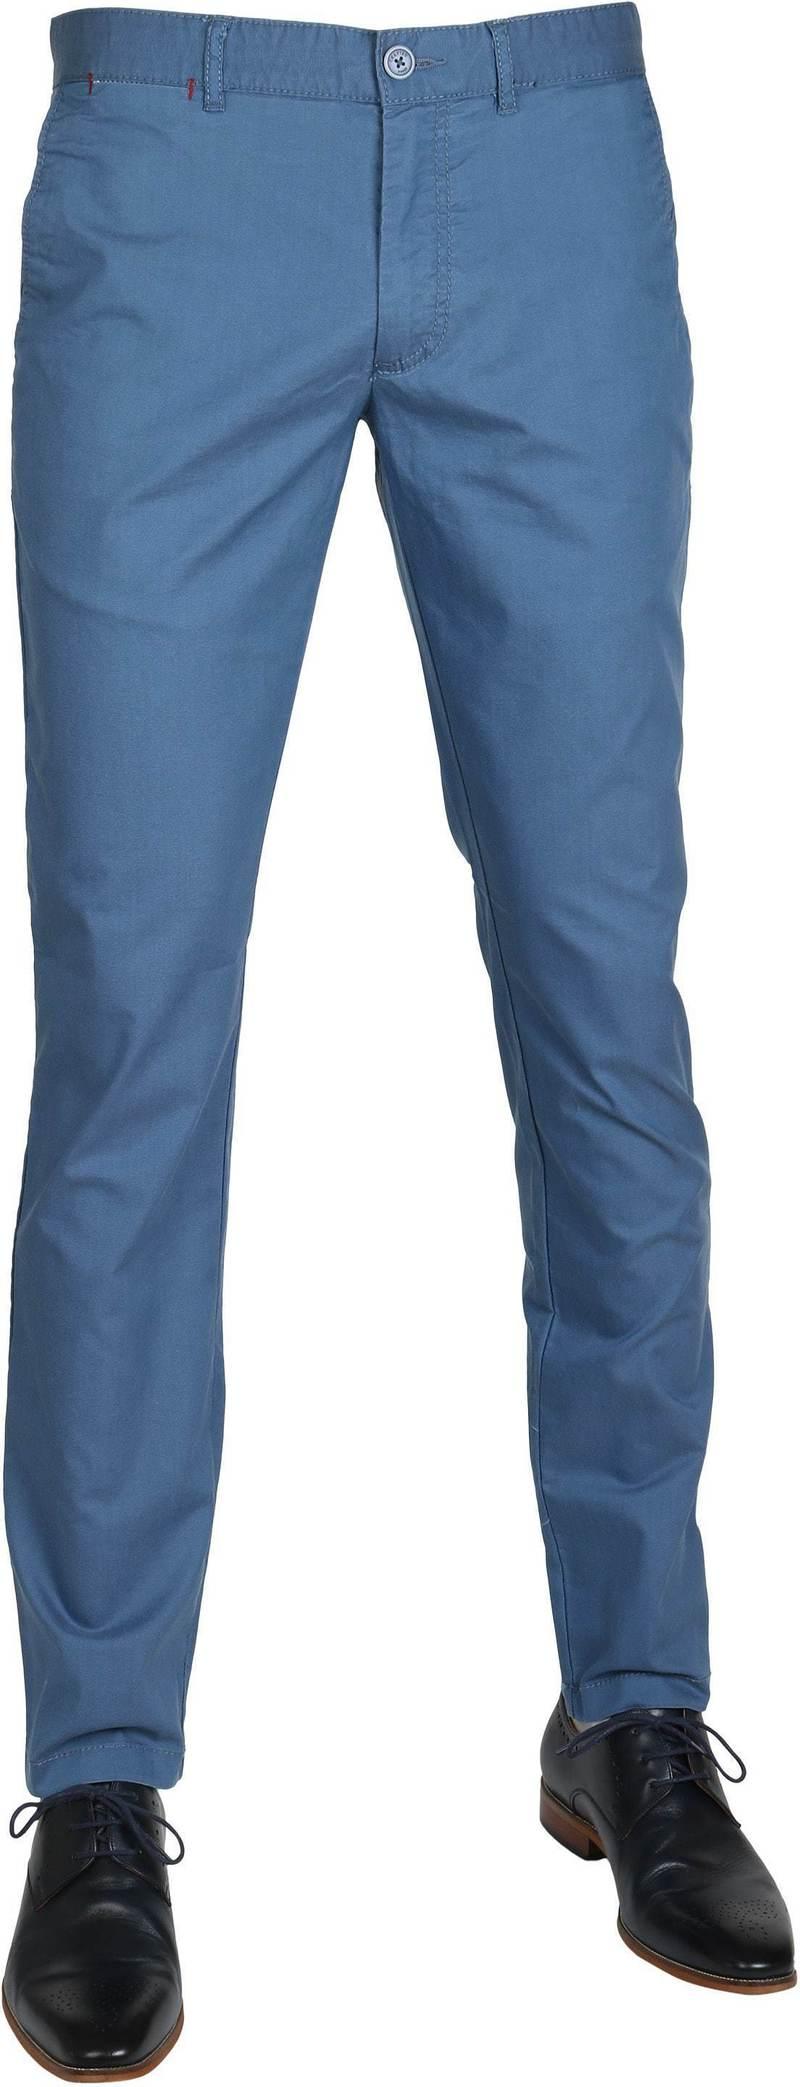 Suitable Dante Chino Blau  online kaufen | Suitable